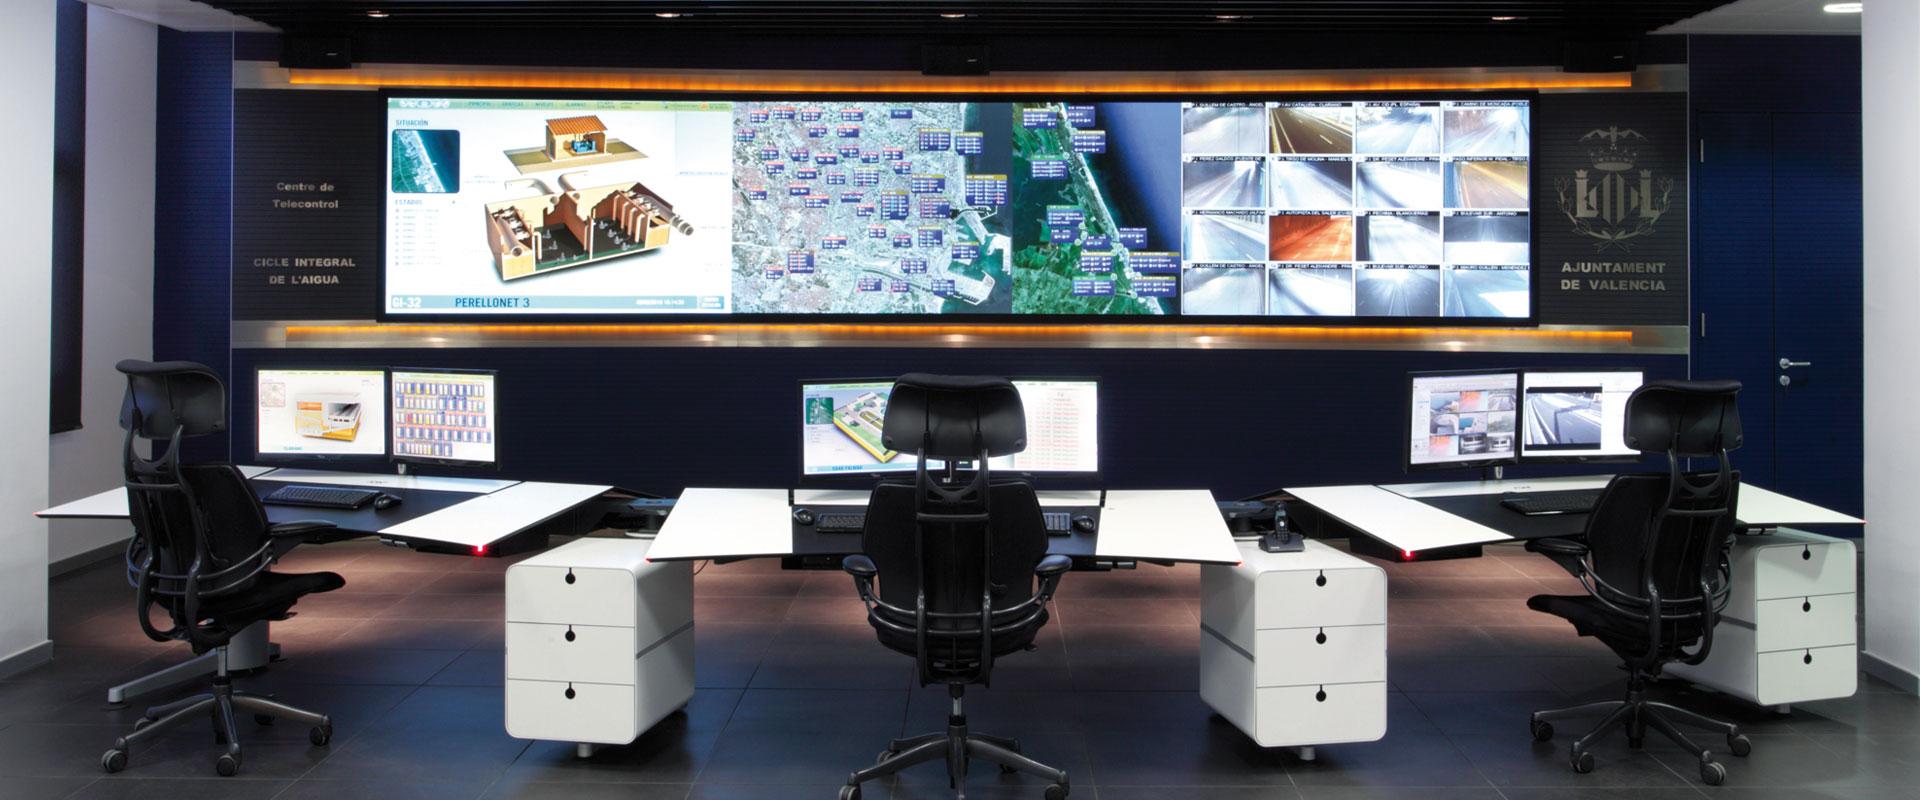 centros de control gesab